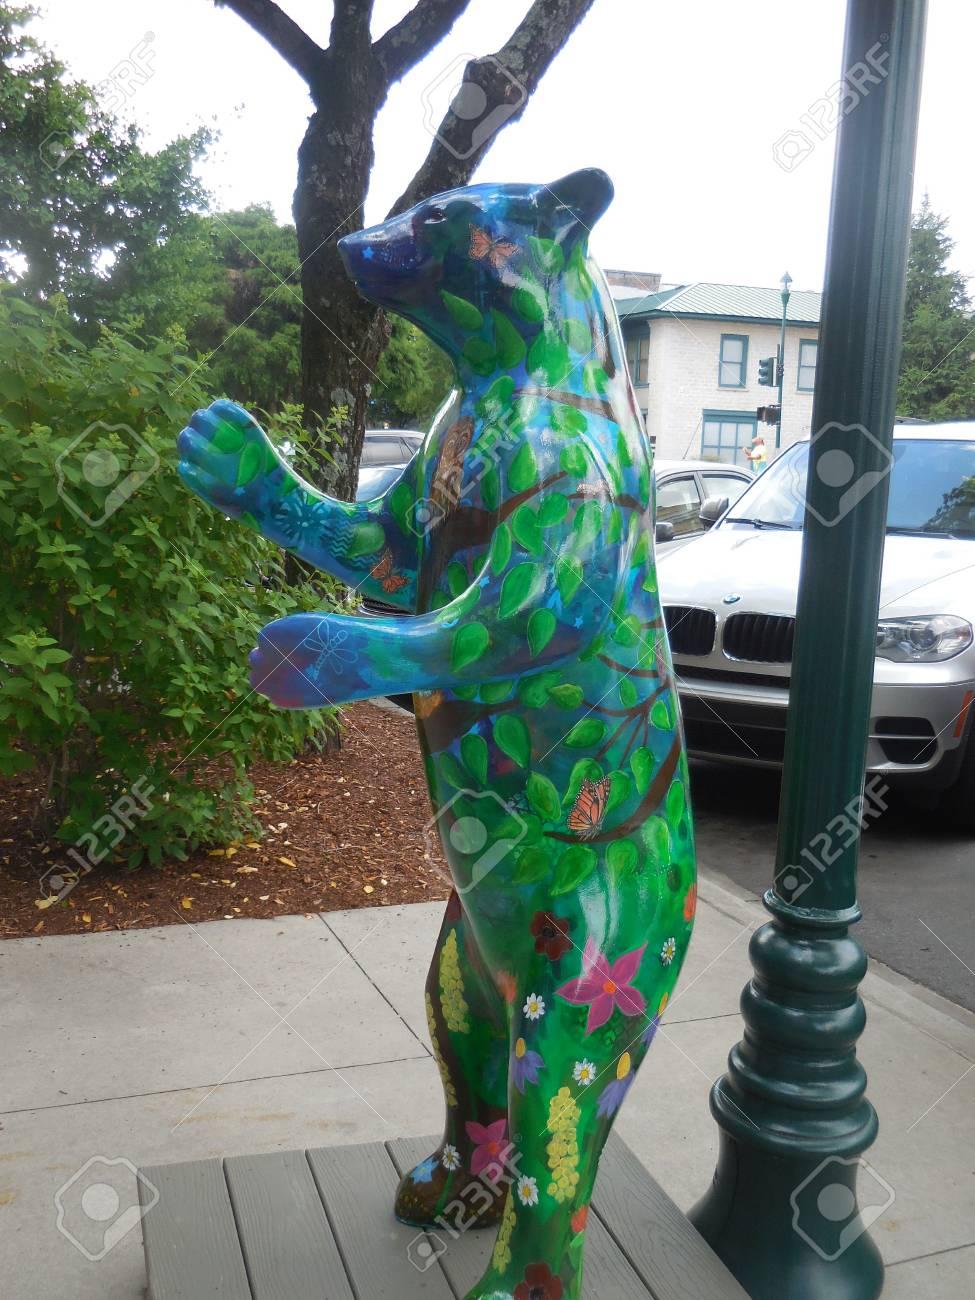 June 17, 2017 - Hendersonville, NC - decorative bear Stock Photo - 93494301